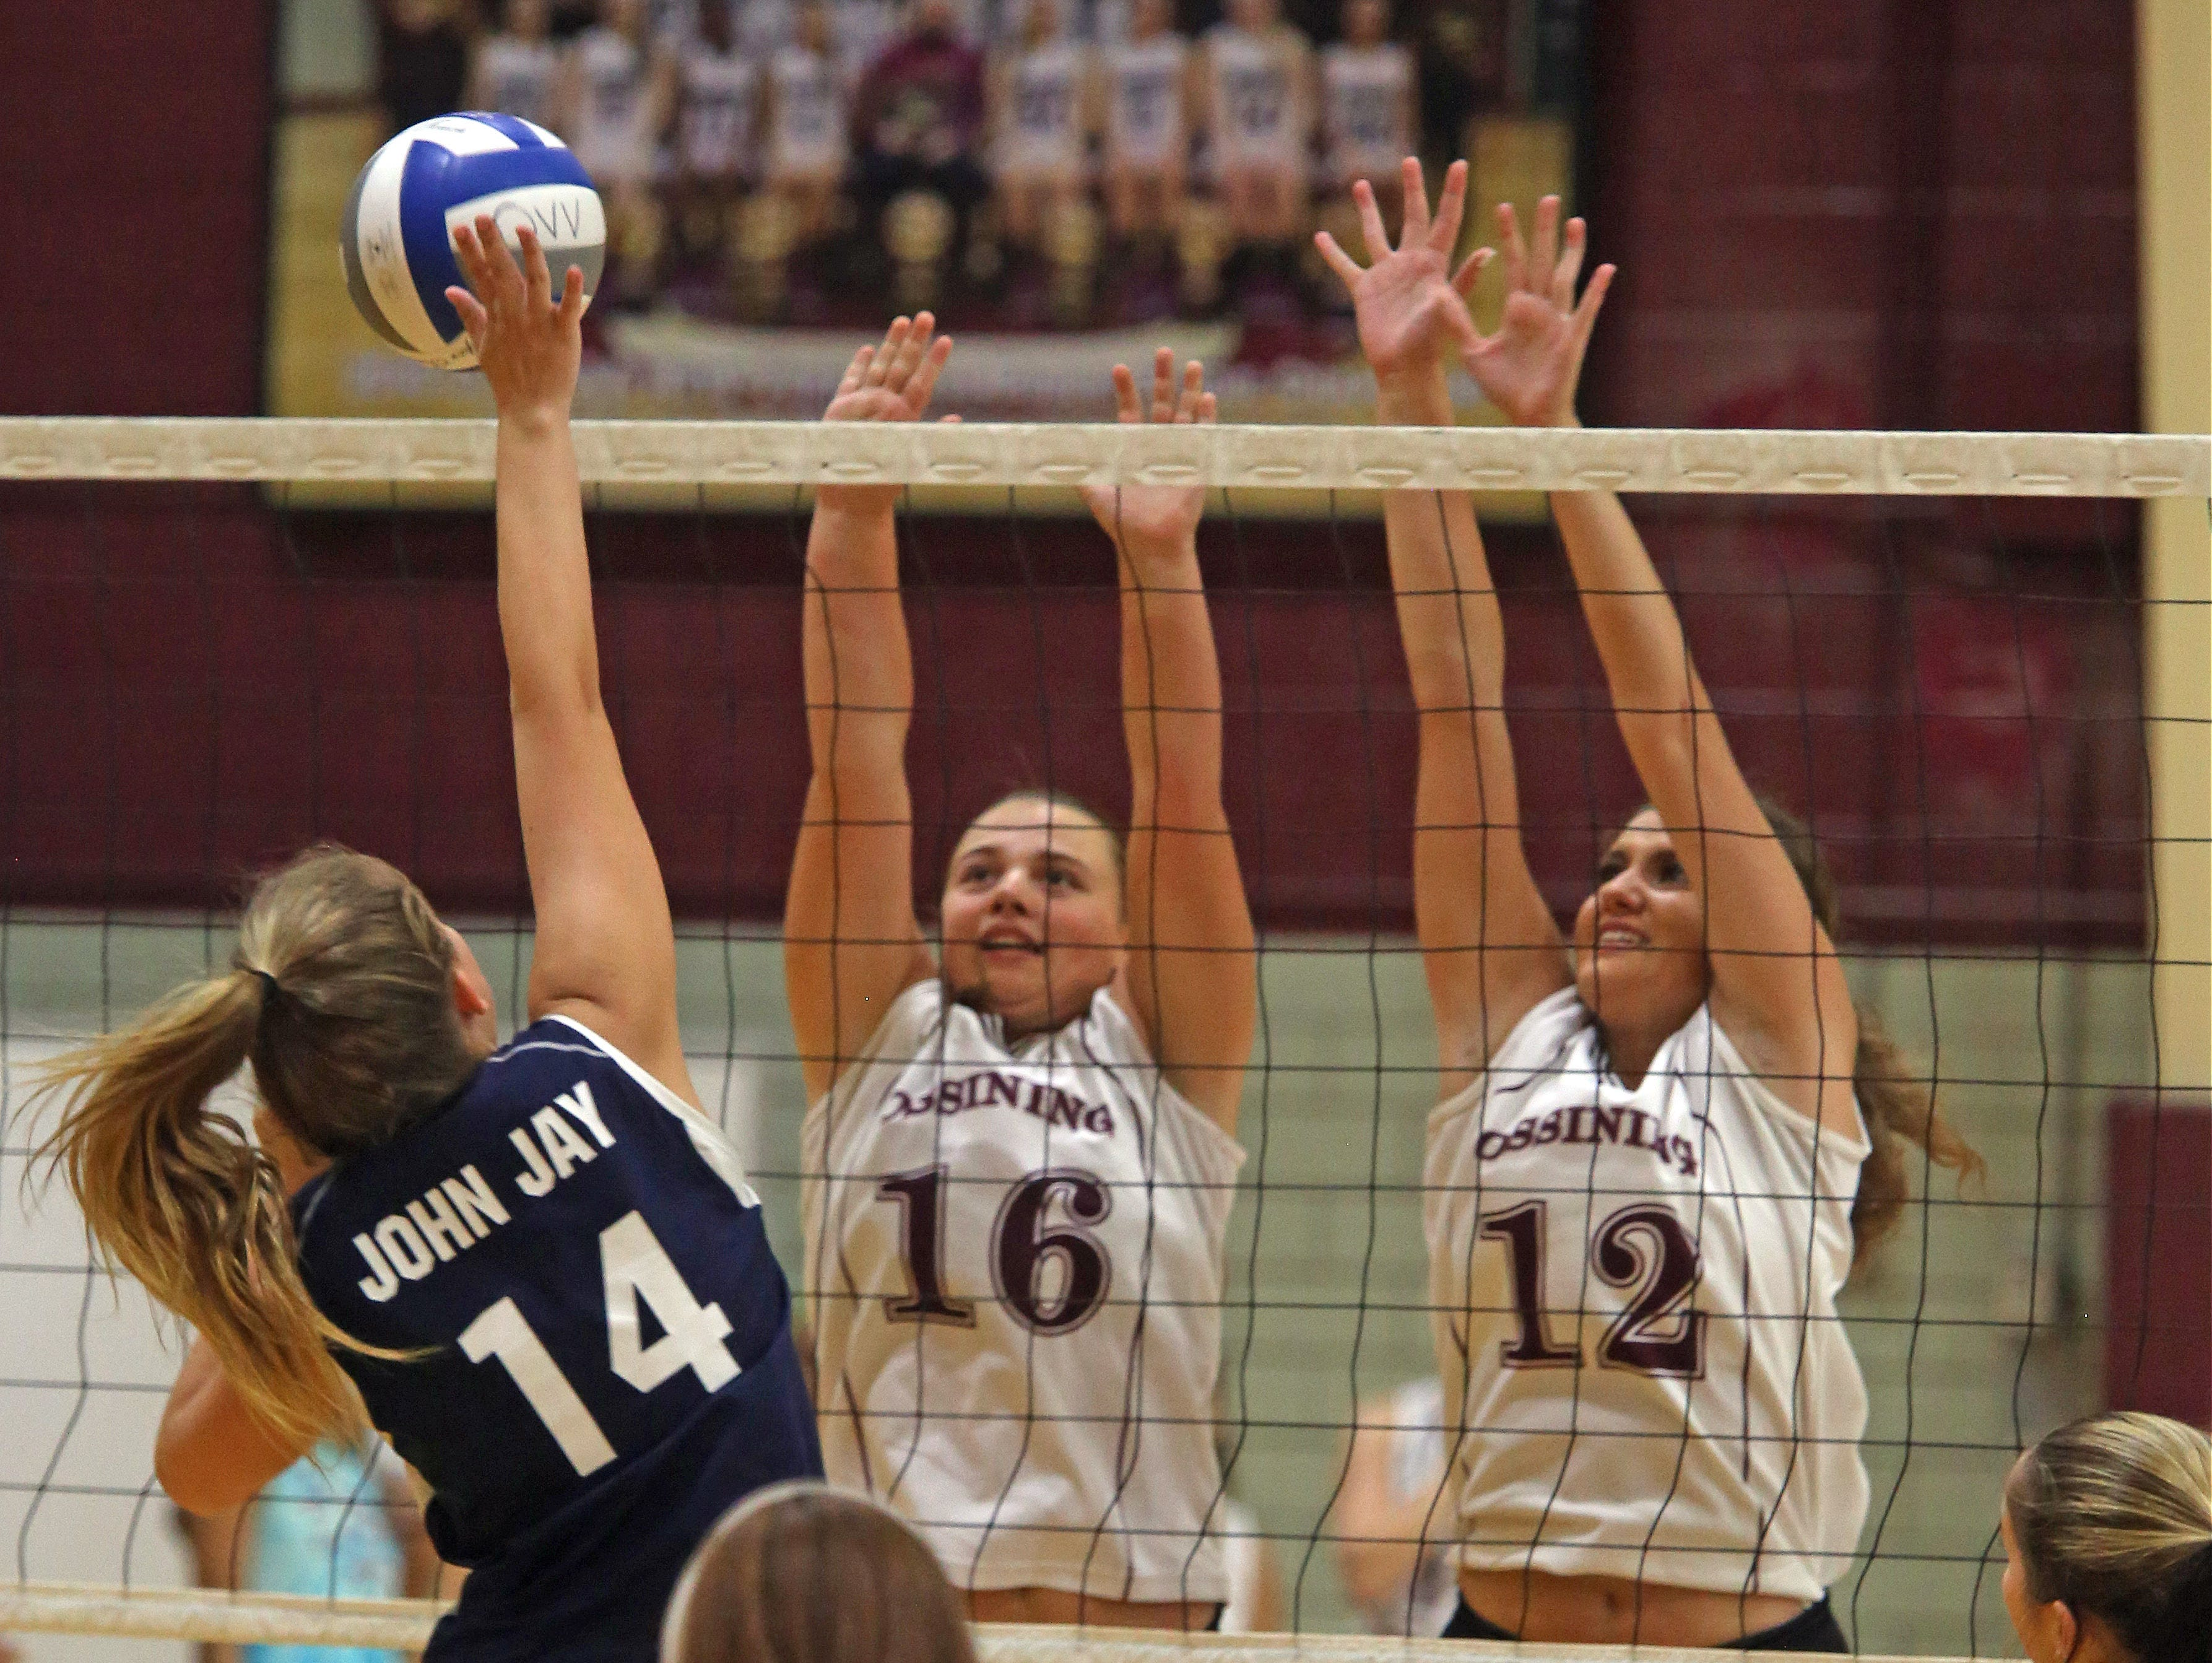 Ossining's Kelsey Quain (16) and Carmela Velardo (12) blocks John Jay East Fishkill shot during girls volleyball at Ossining High School on Tuesday, Sept. 6, 3016.